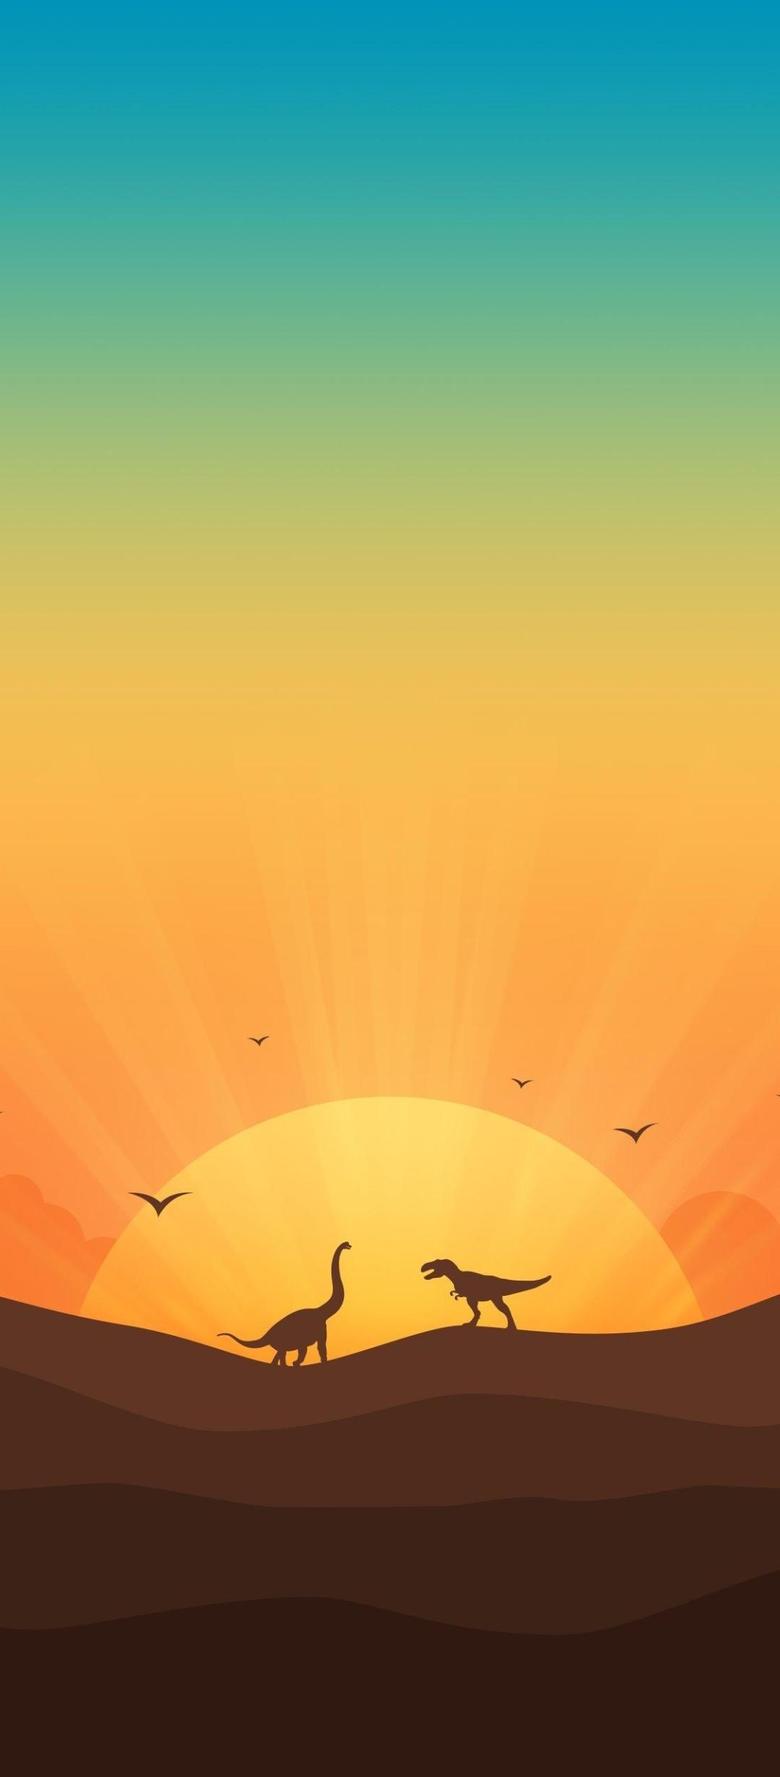 x2460 Dinosaurs In Gradient Sunrise 1080x2460 Resolution